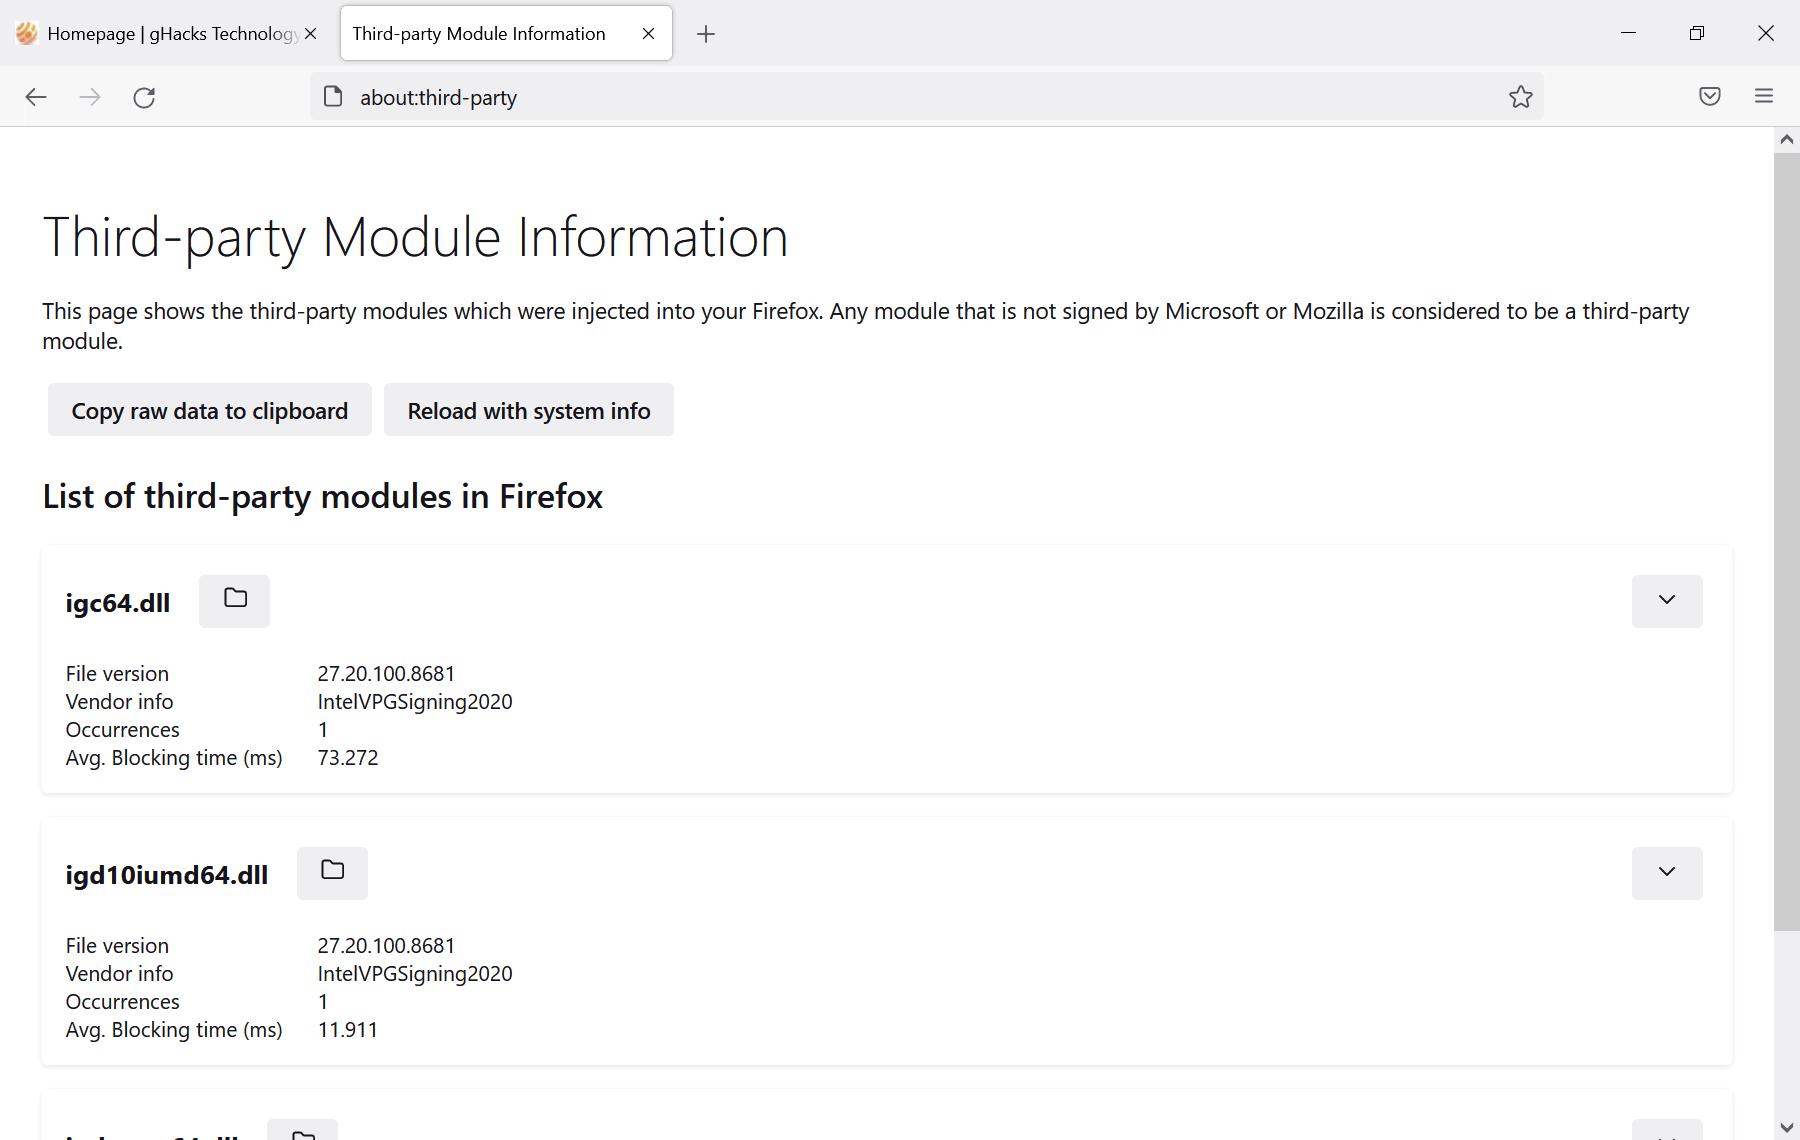 firefox third-party modules